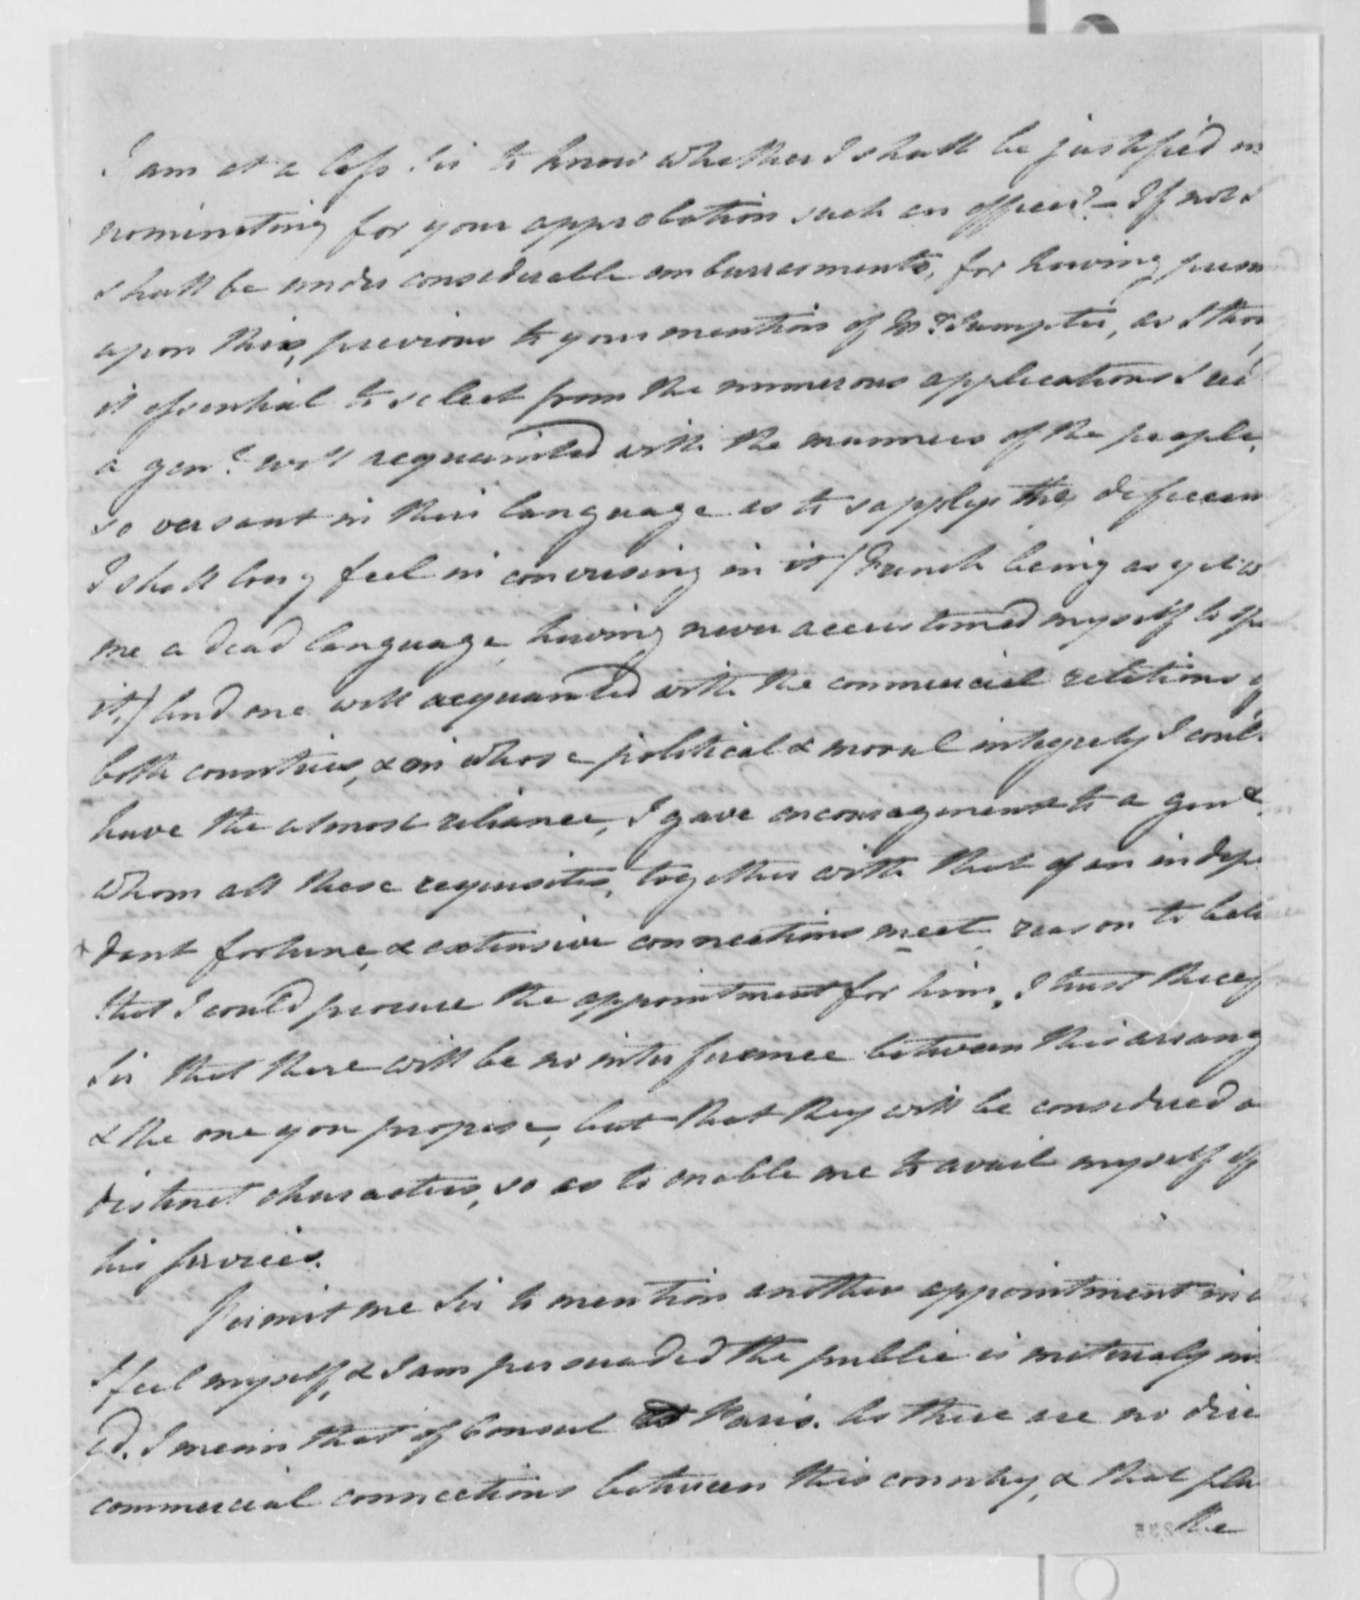 Robert R. Livingston to Thomas Jefferson, May 2, 1801